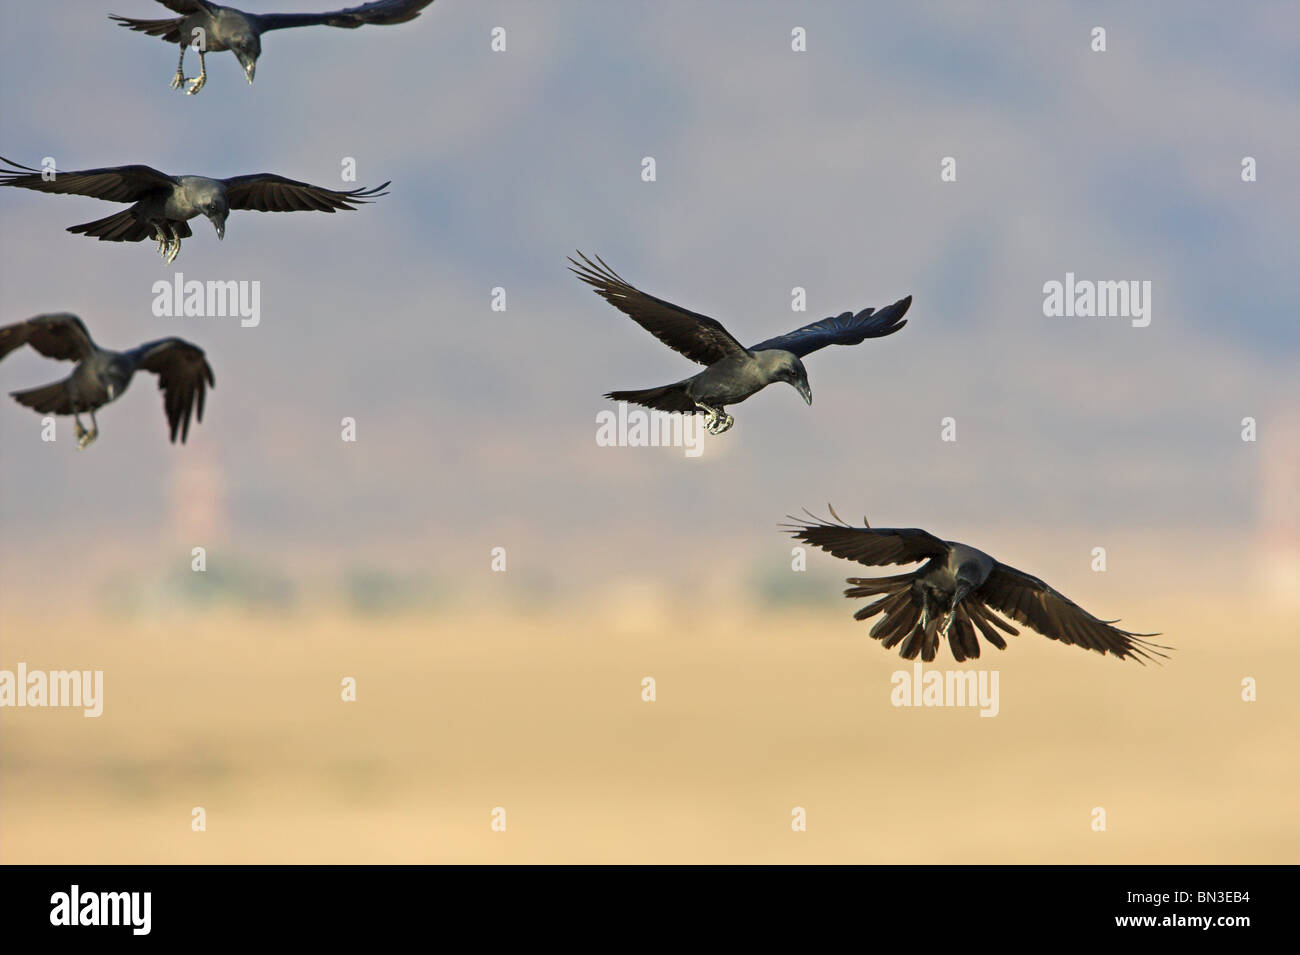 Haus Krähen (Corvus Splendens) fliegen, niedrigen Winkel Ansicht Stockbild